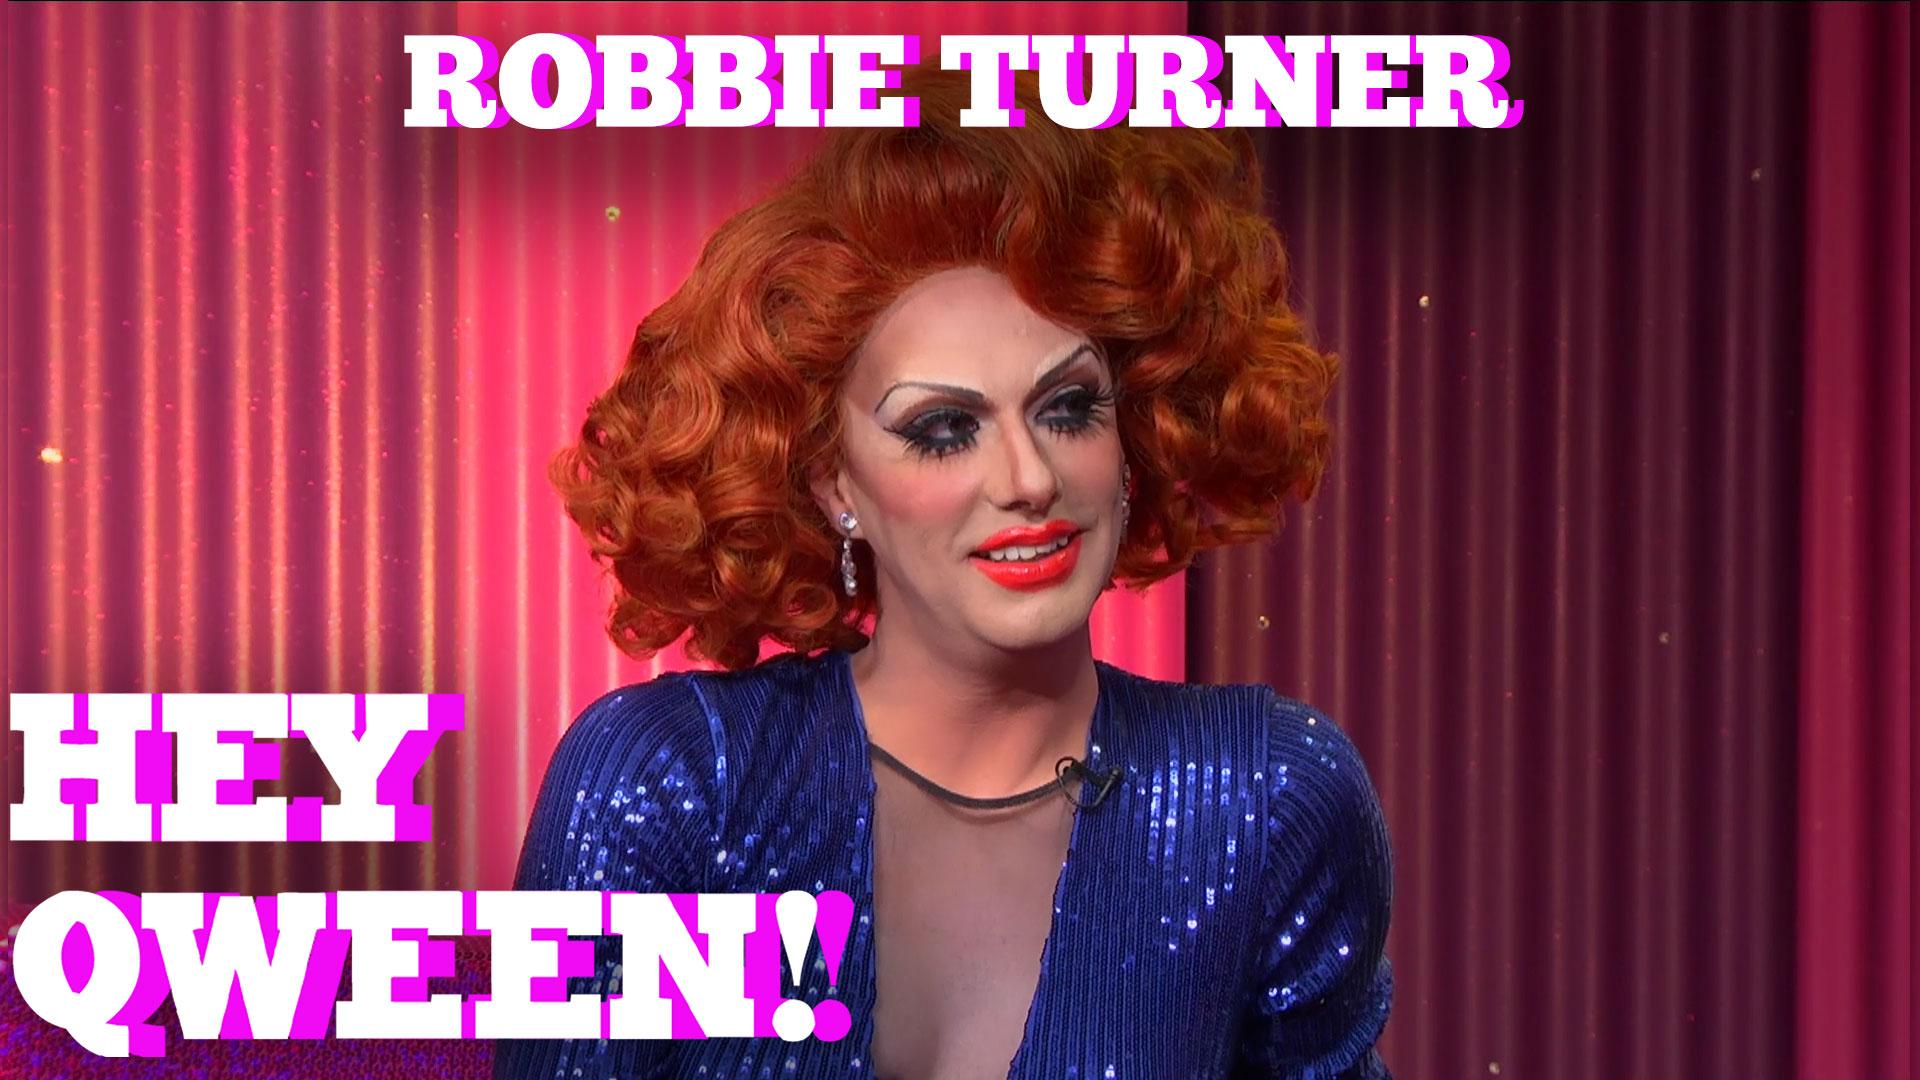 ROBBIE TURNER on HEY QWEEN! with Jonny McGovern